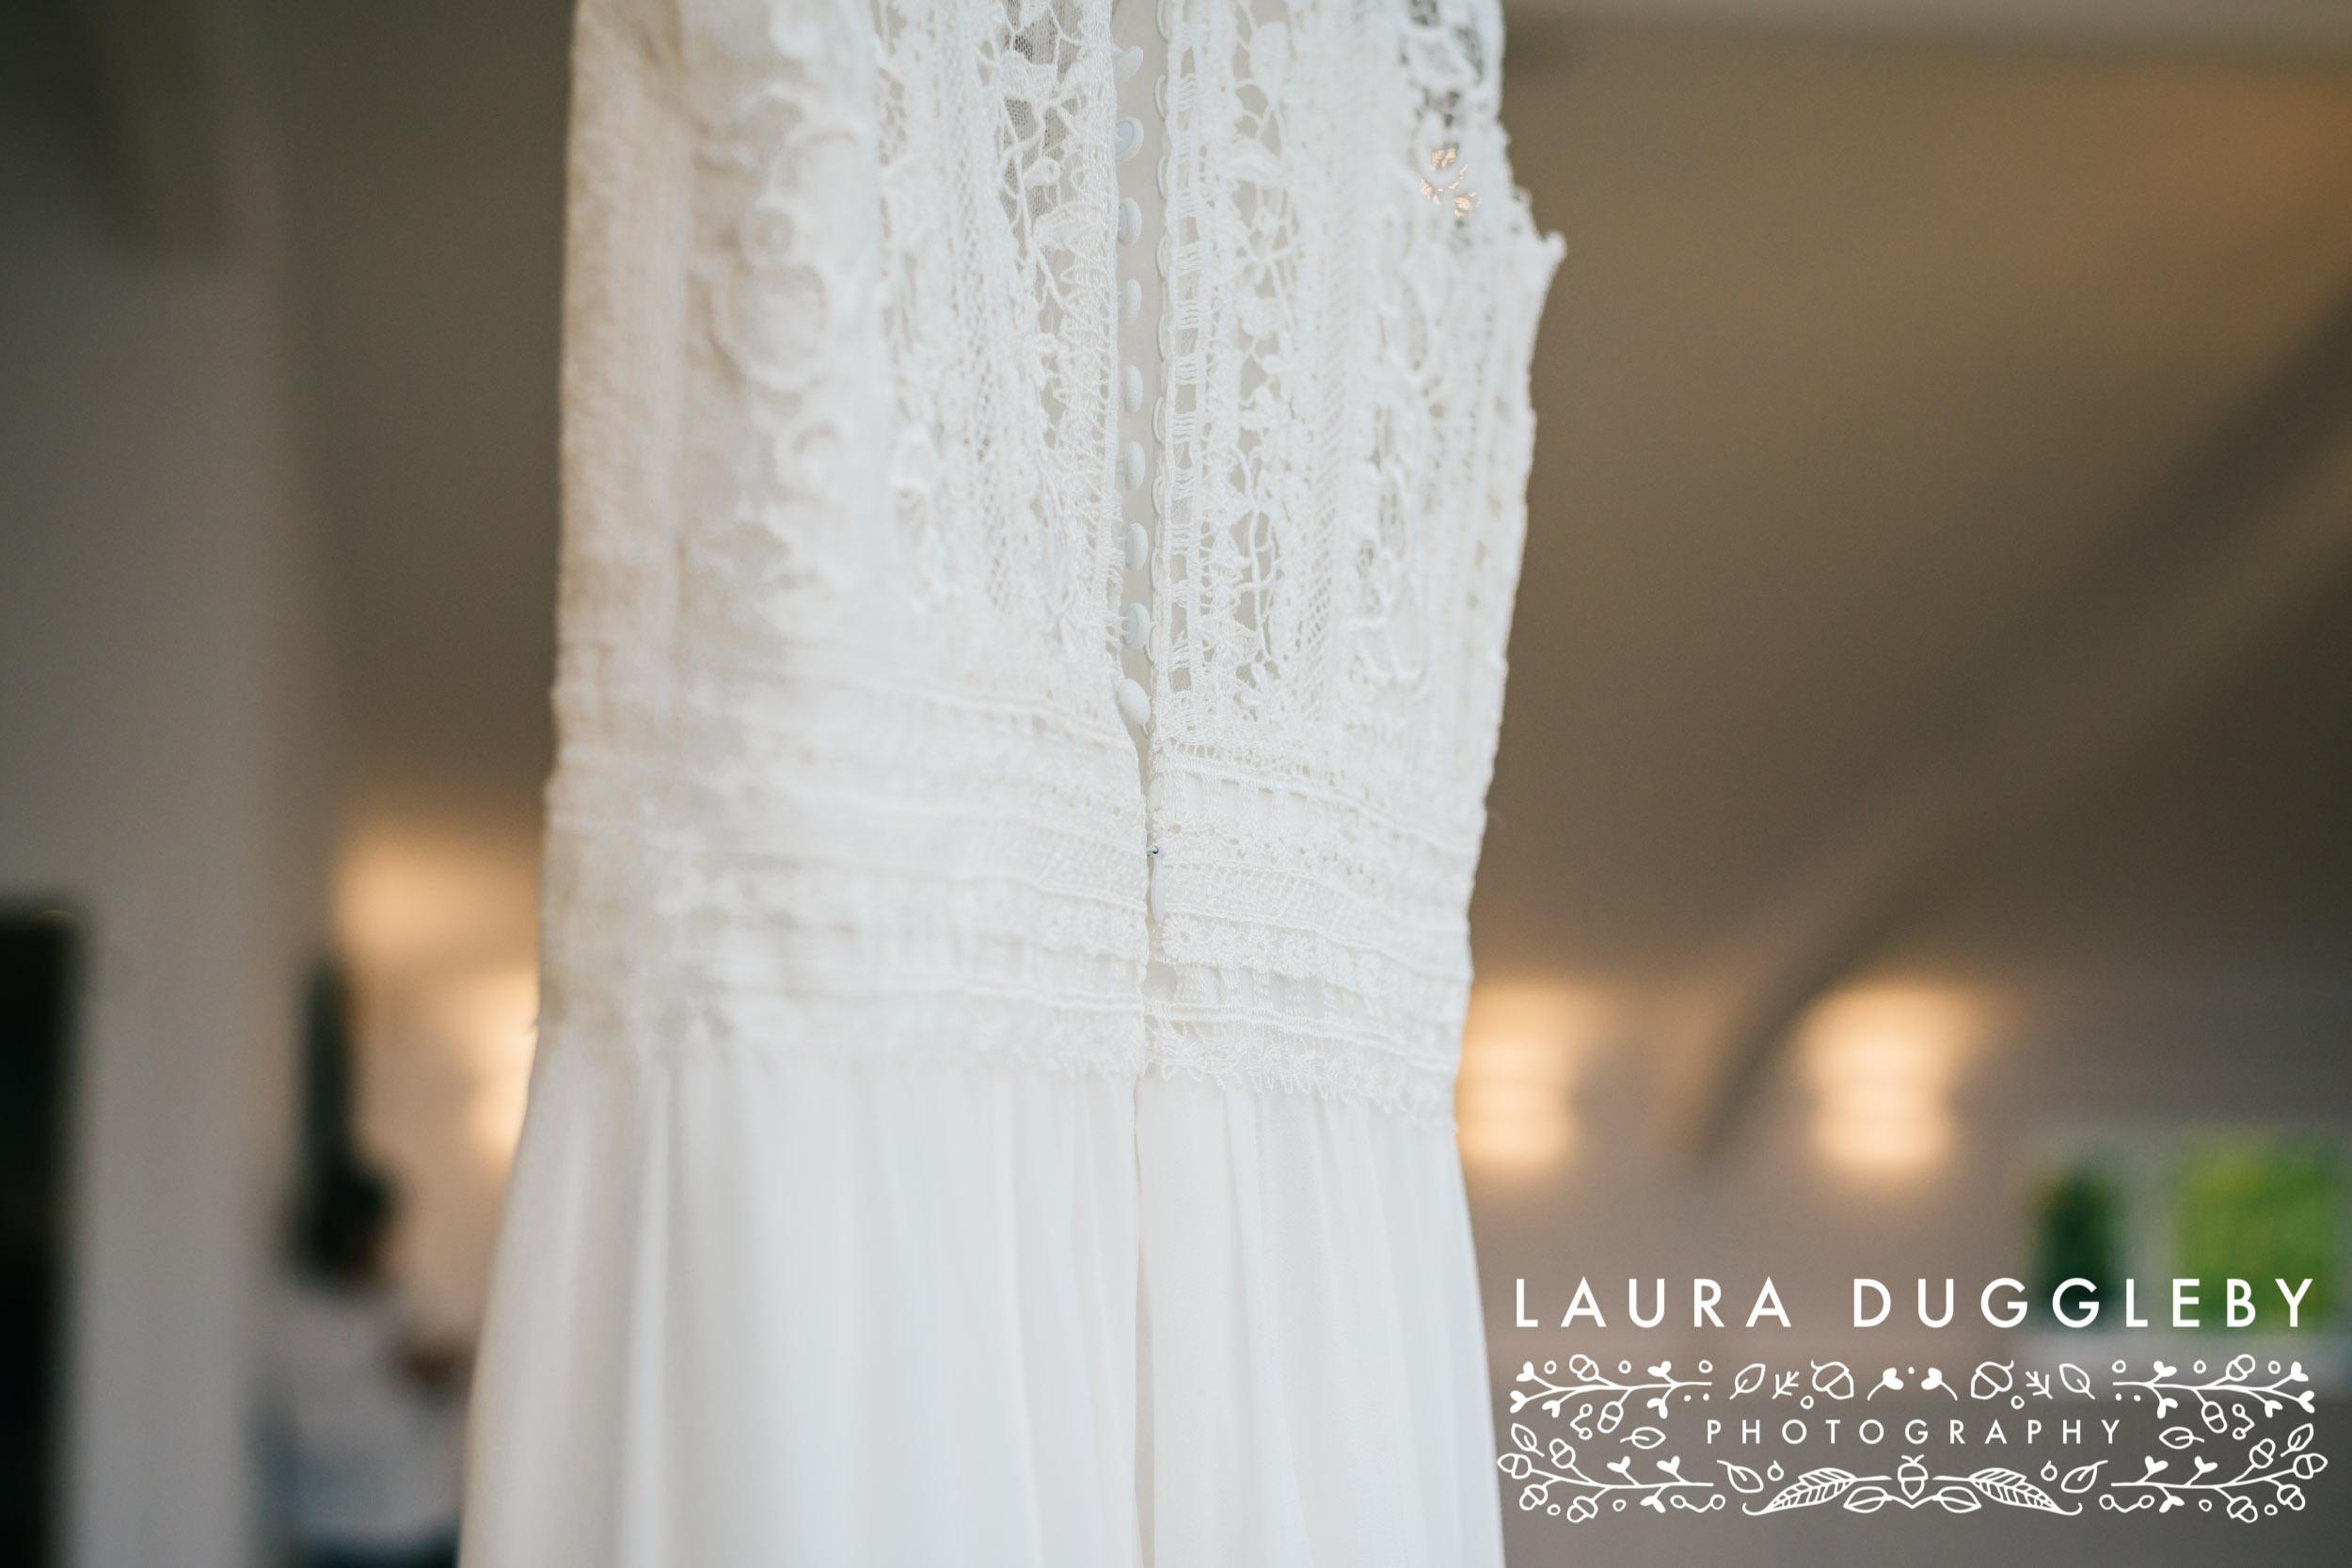 Thornton Hall Country Park - Wedding Photographer5